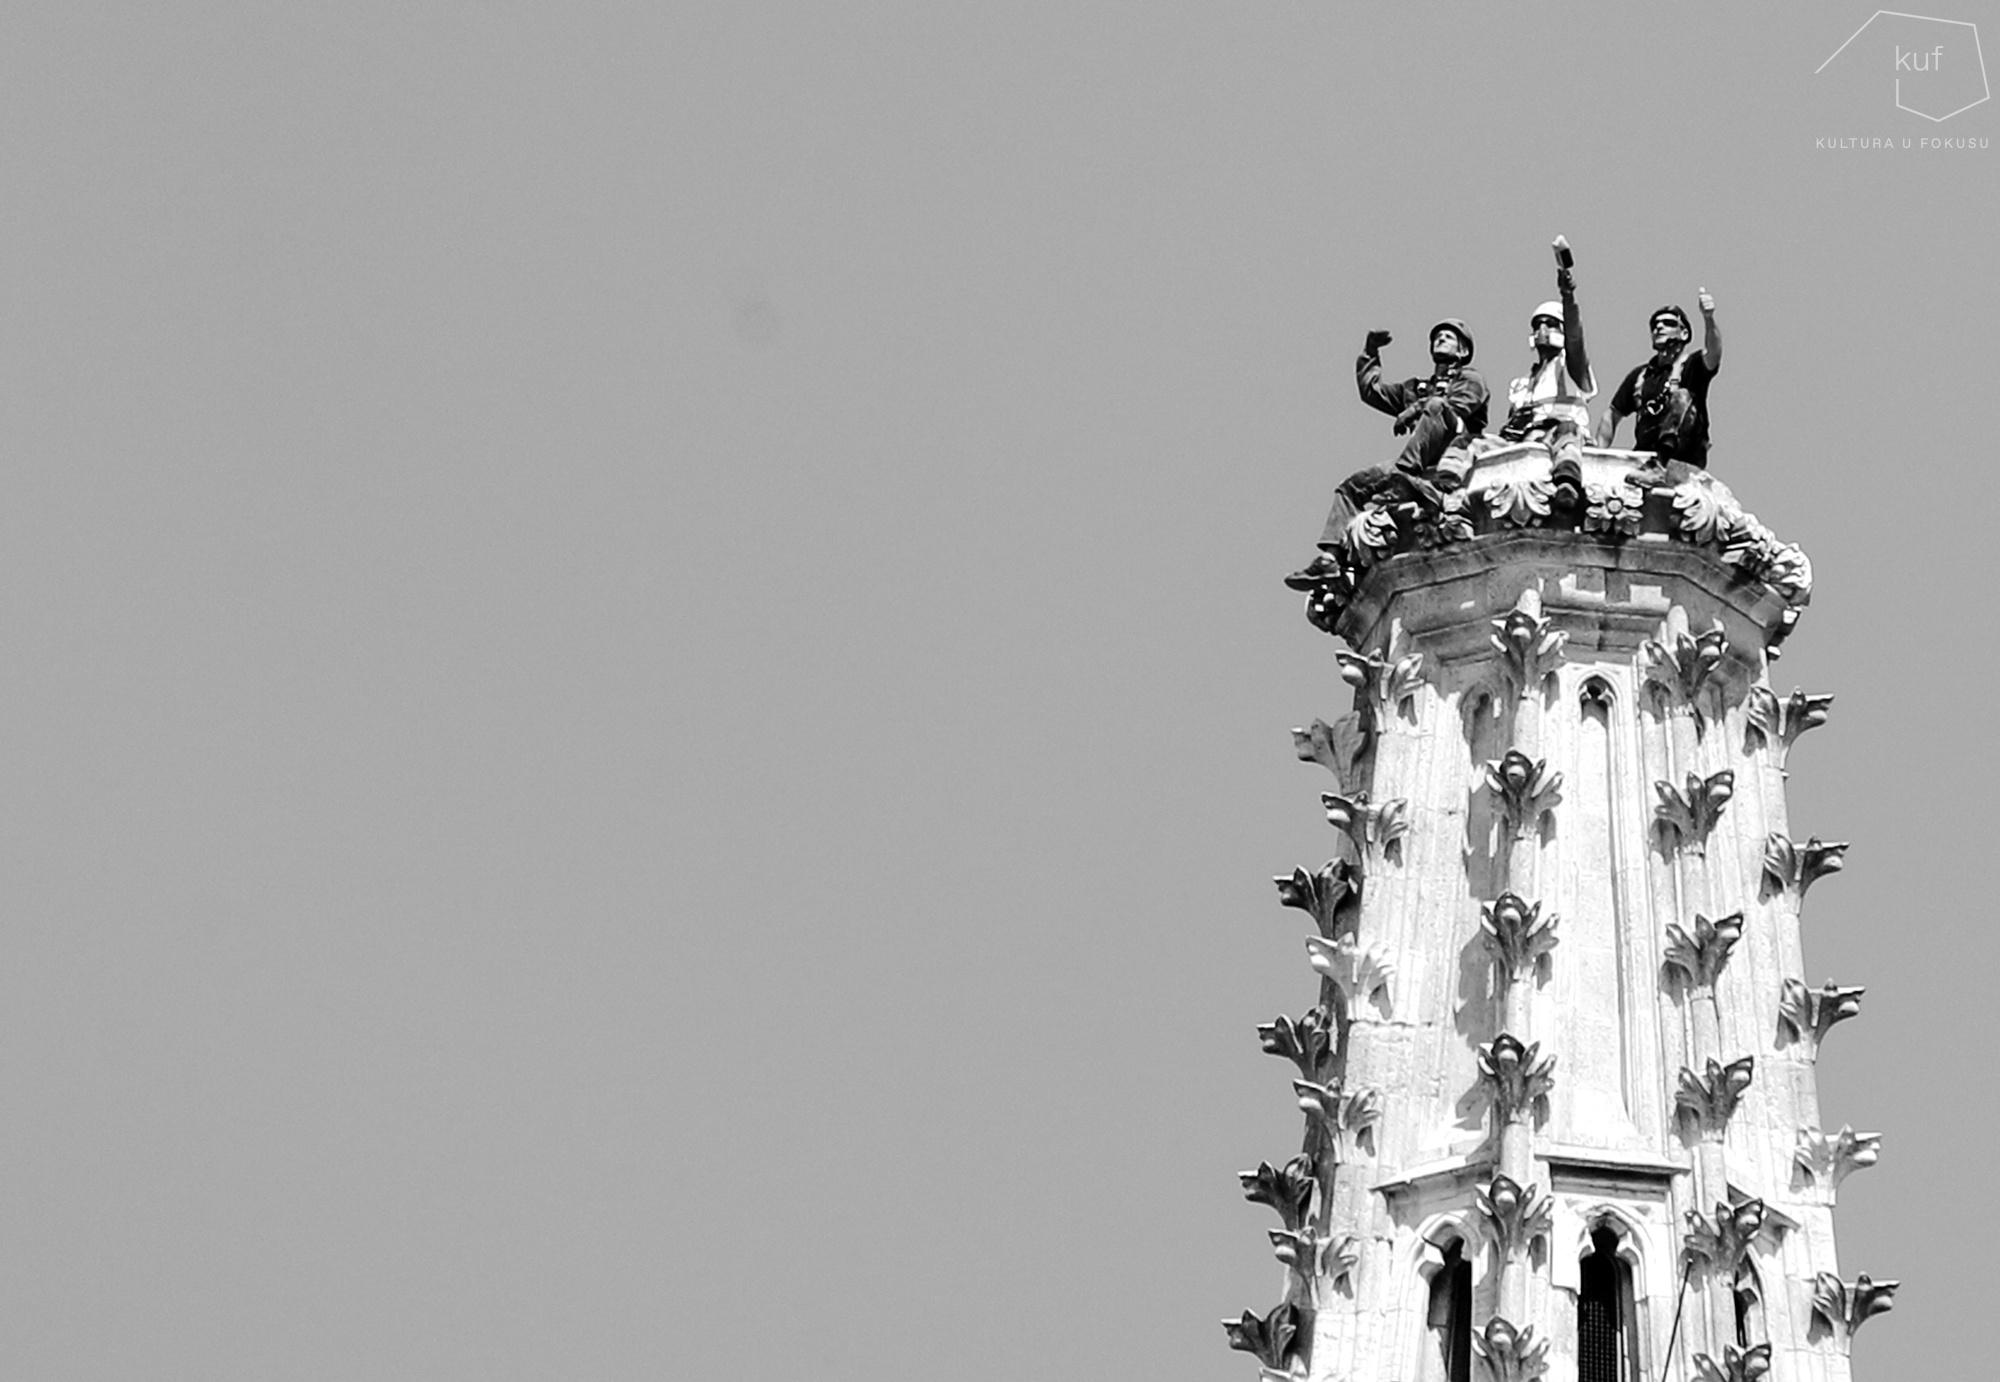 Spašeno kulturno blago - toranj katedrale.